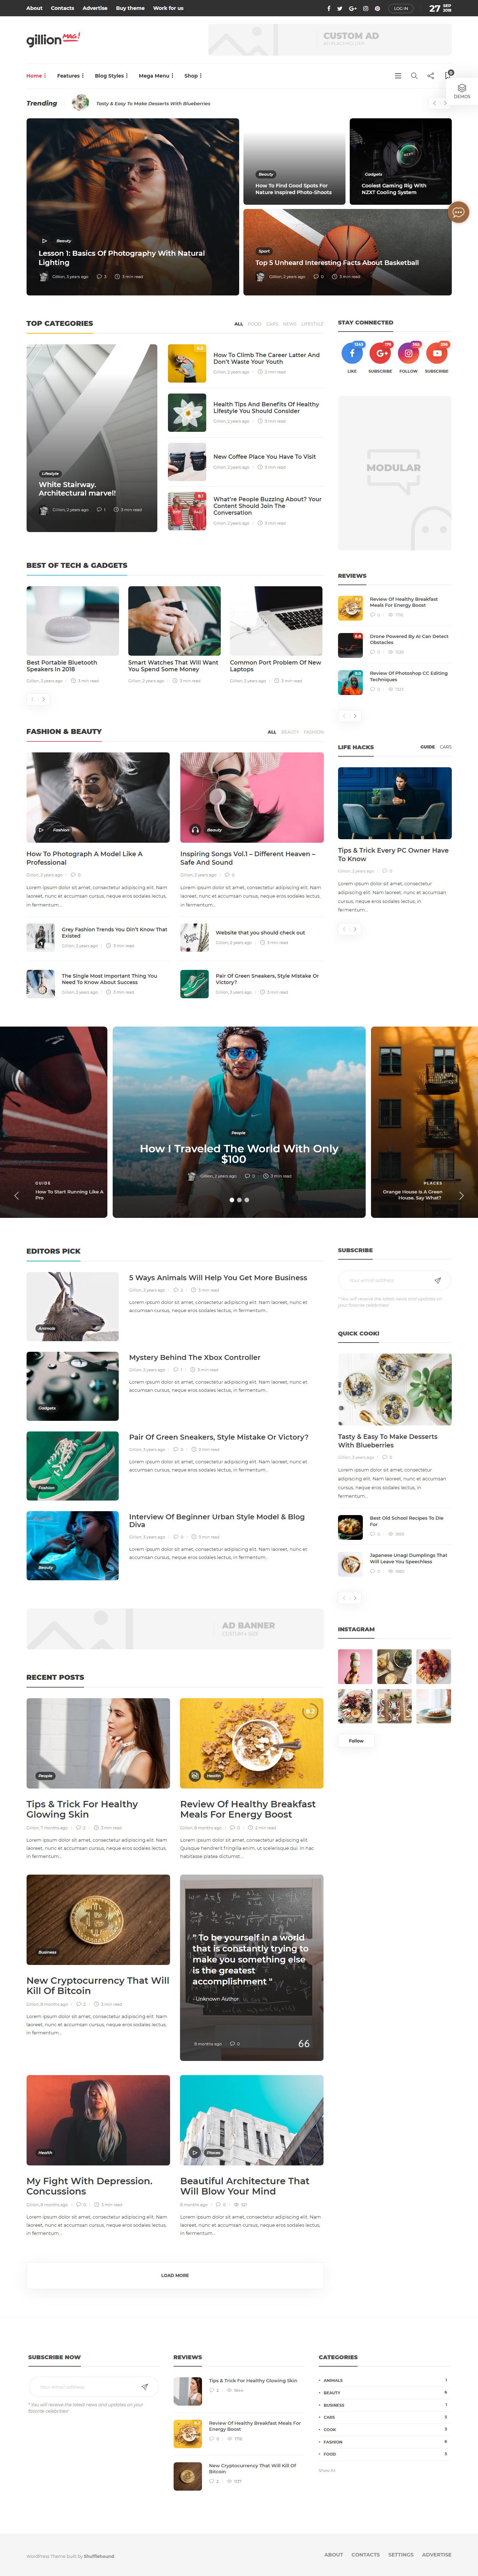 Gillion - Best Premium Adsense Optimized WordPress ThemeGillion - Best Premium Adsense Optimized WordPress Theme